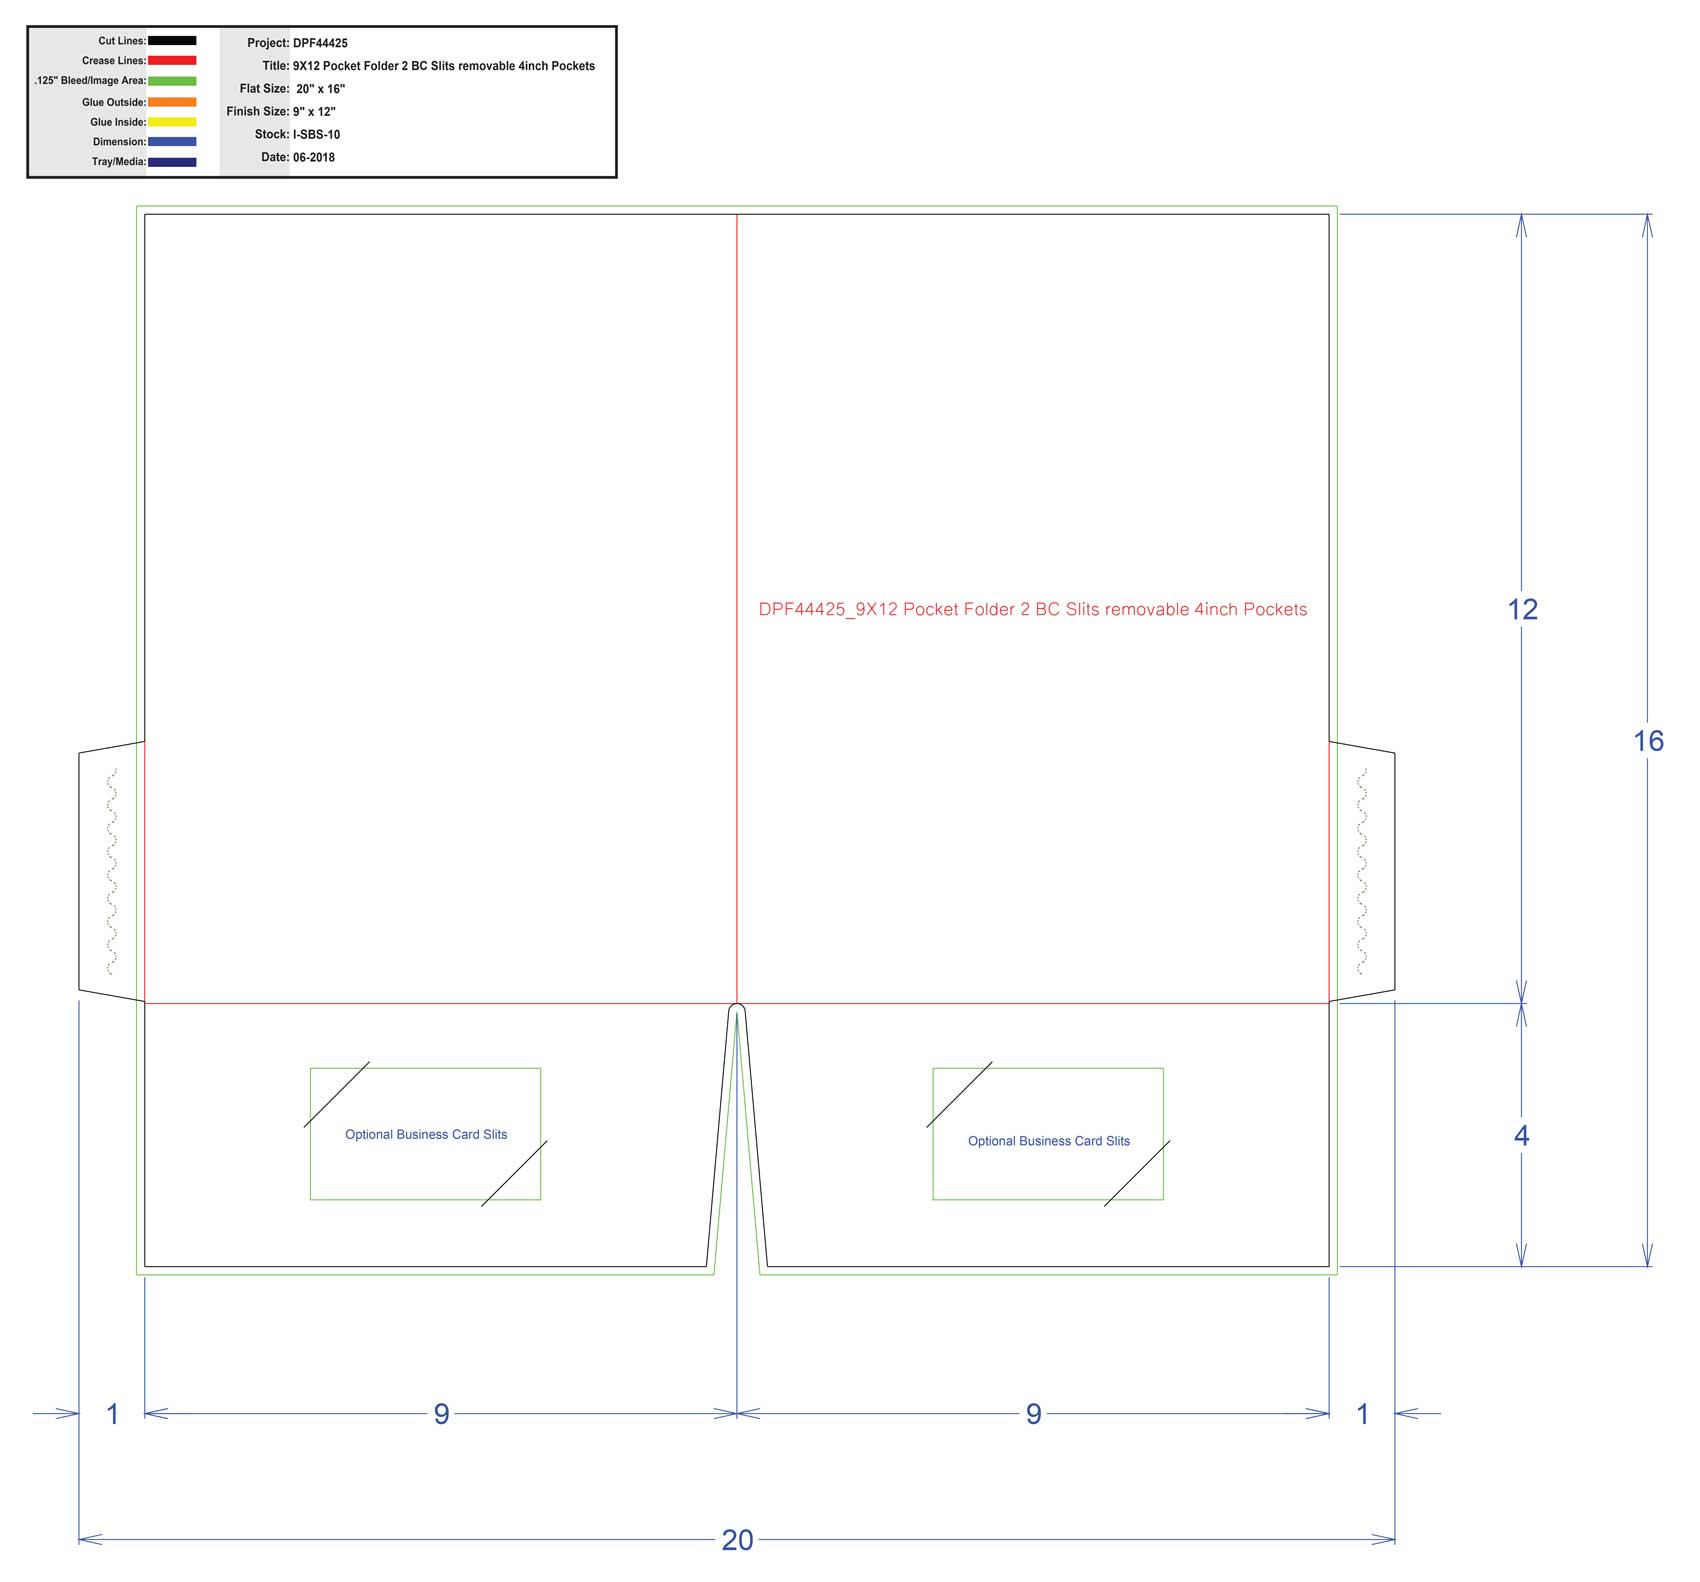 DPF44425_9X12 Pocket Folder 2 BC Slits removable 4inch Pockets